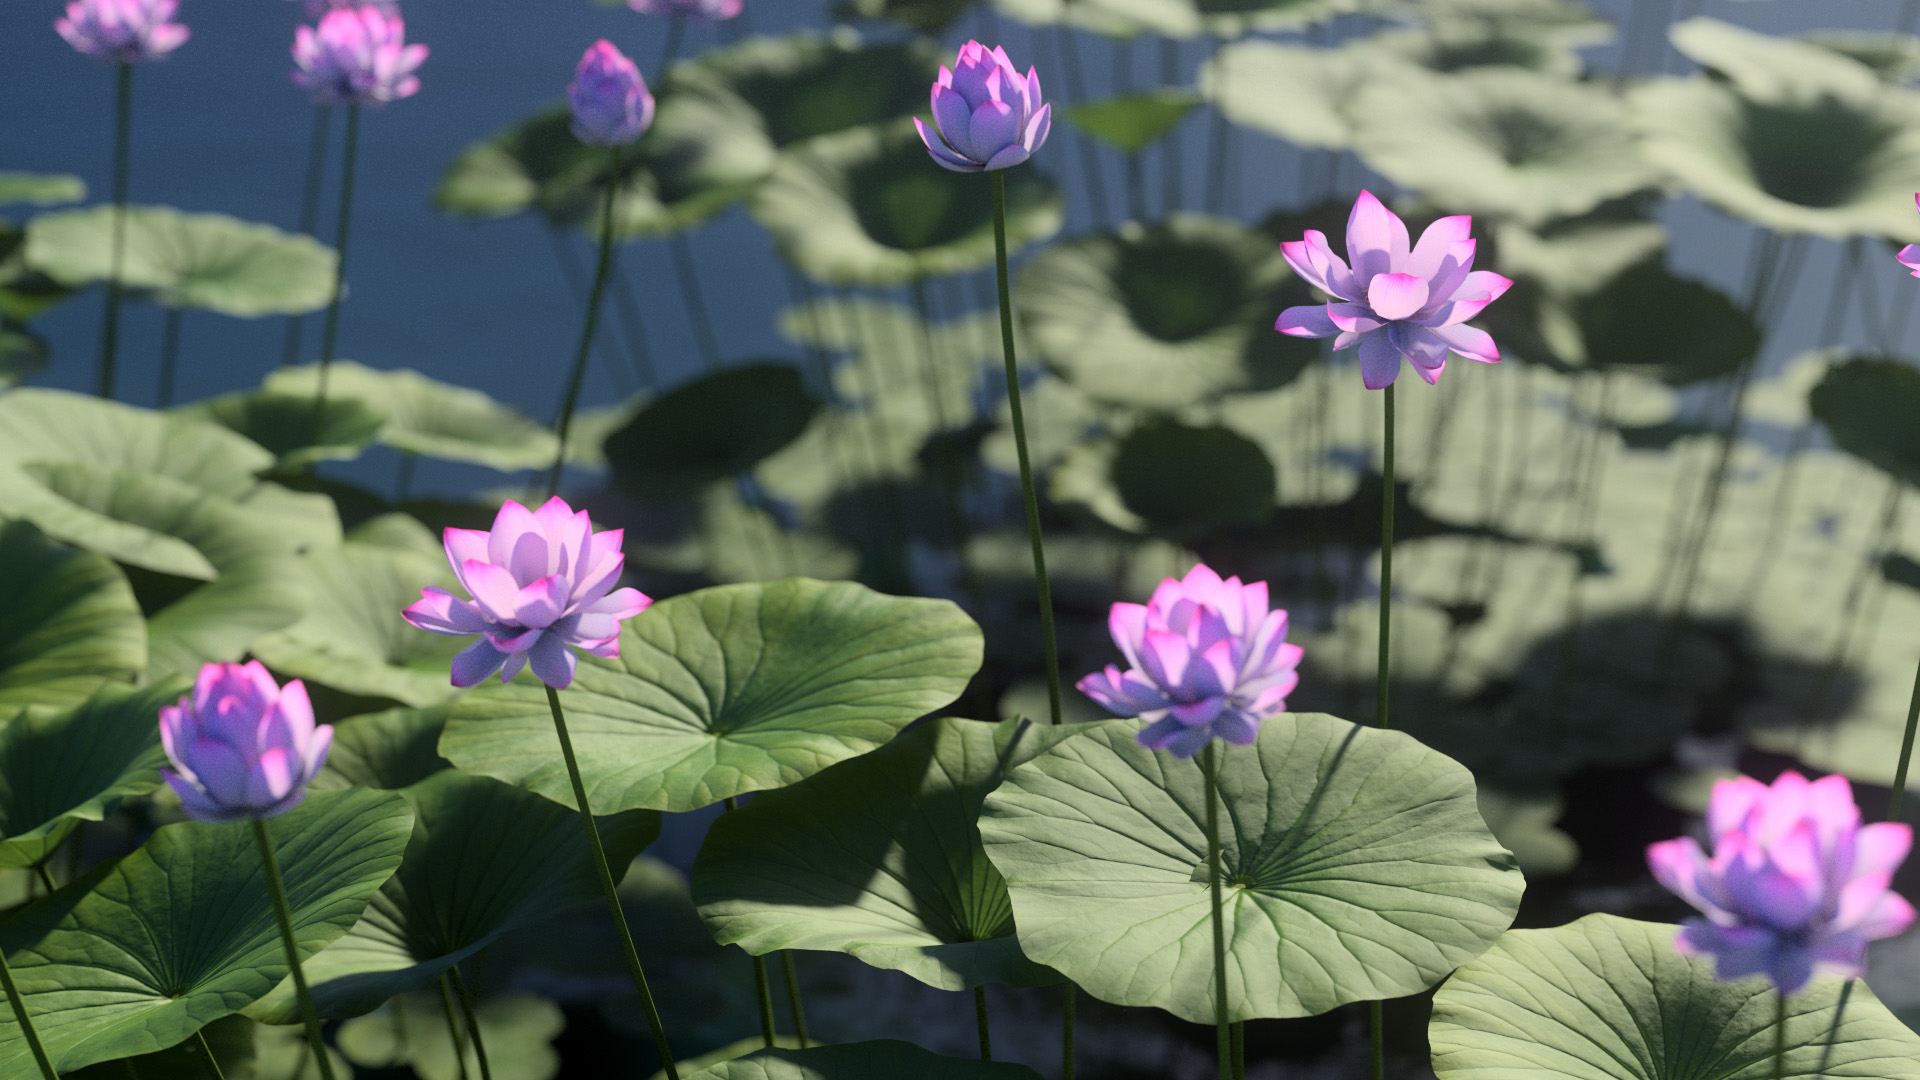 3D model of the Sacred lotus Nelumbo nucifera close-up